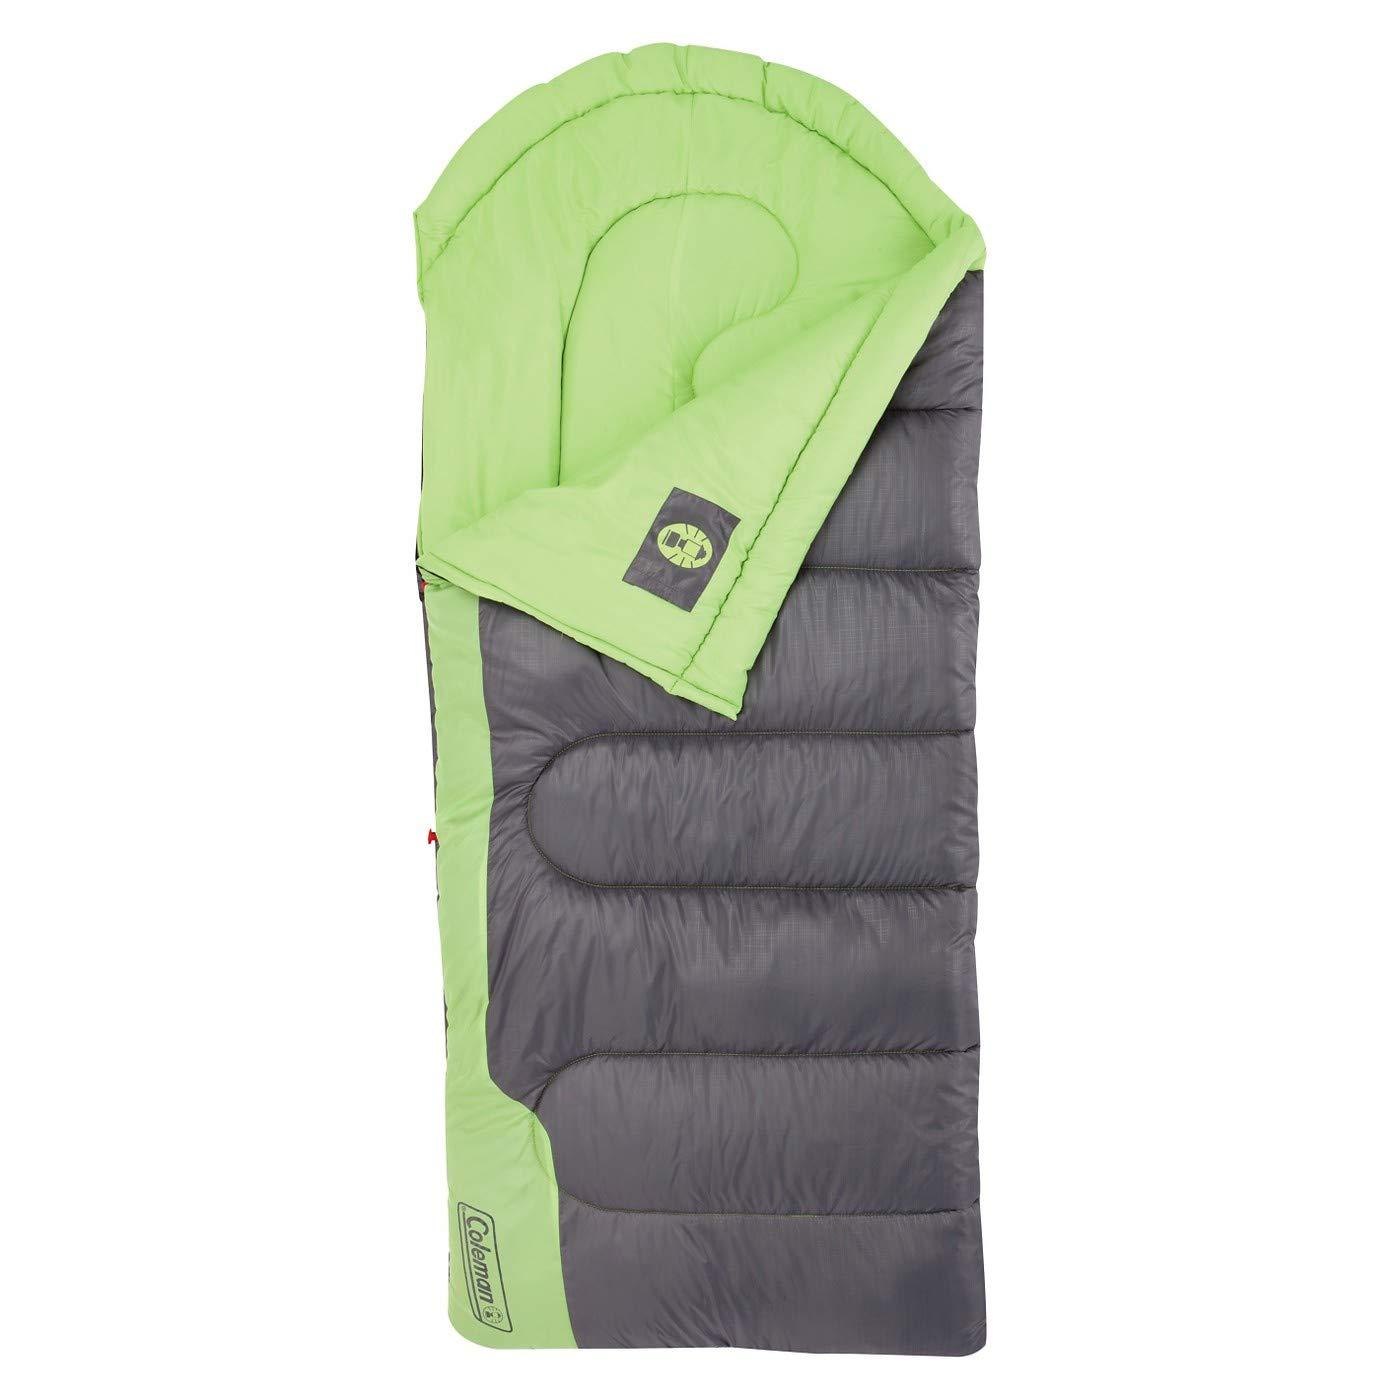 An image of Coleman Raymer 40 Degree Sleeping Bag